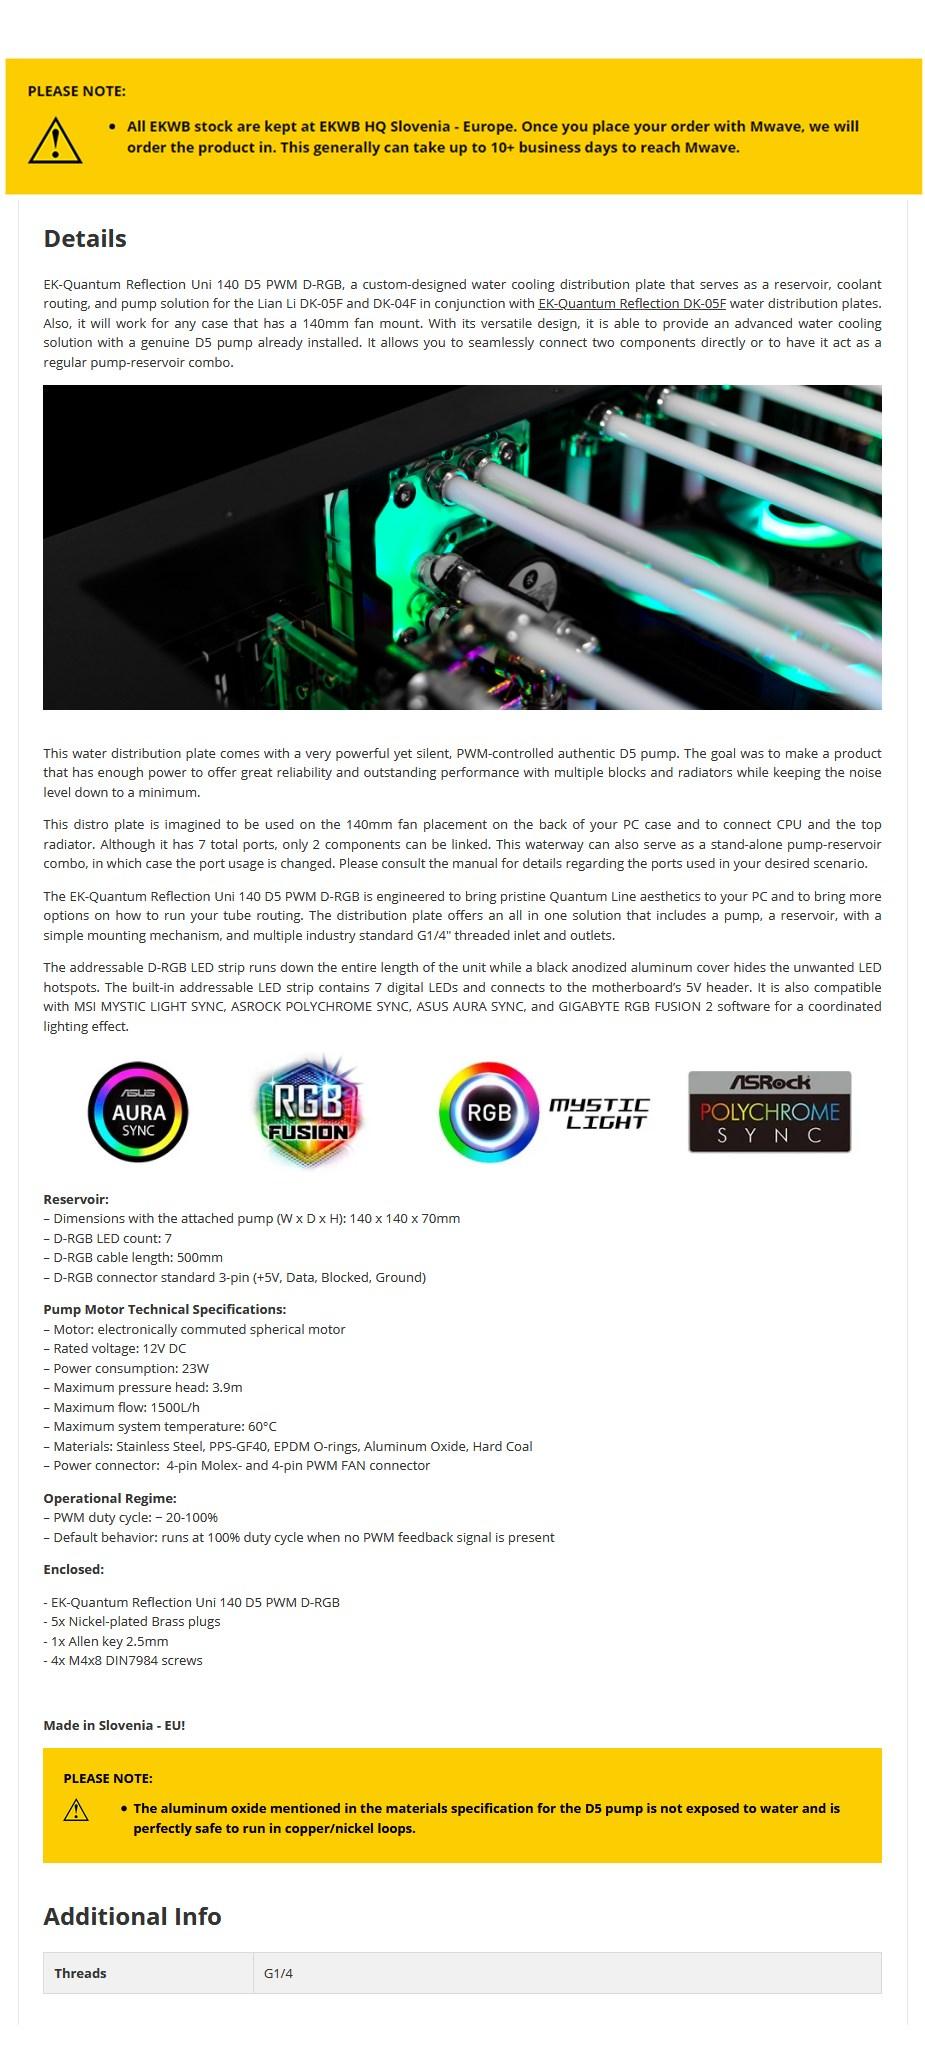 EKWB EK-Quantum Reflection Uni 140 Lian Li D5 PWM D-RGB Cooling Plate - Plexi - Overview 1